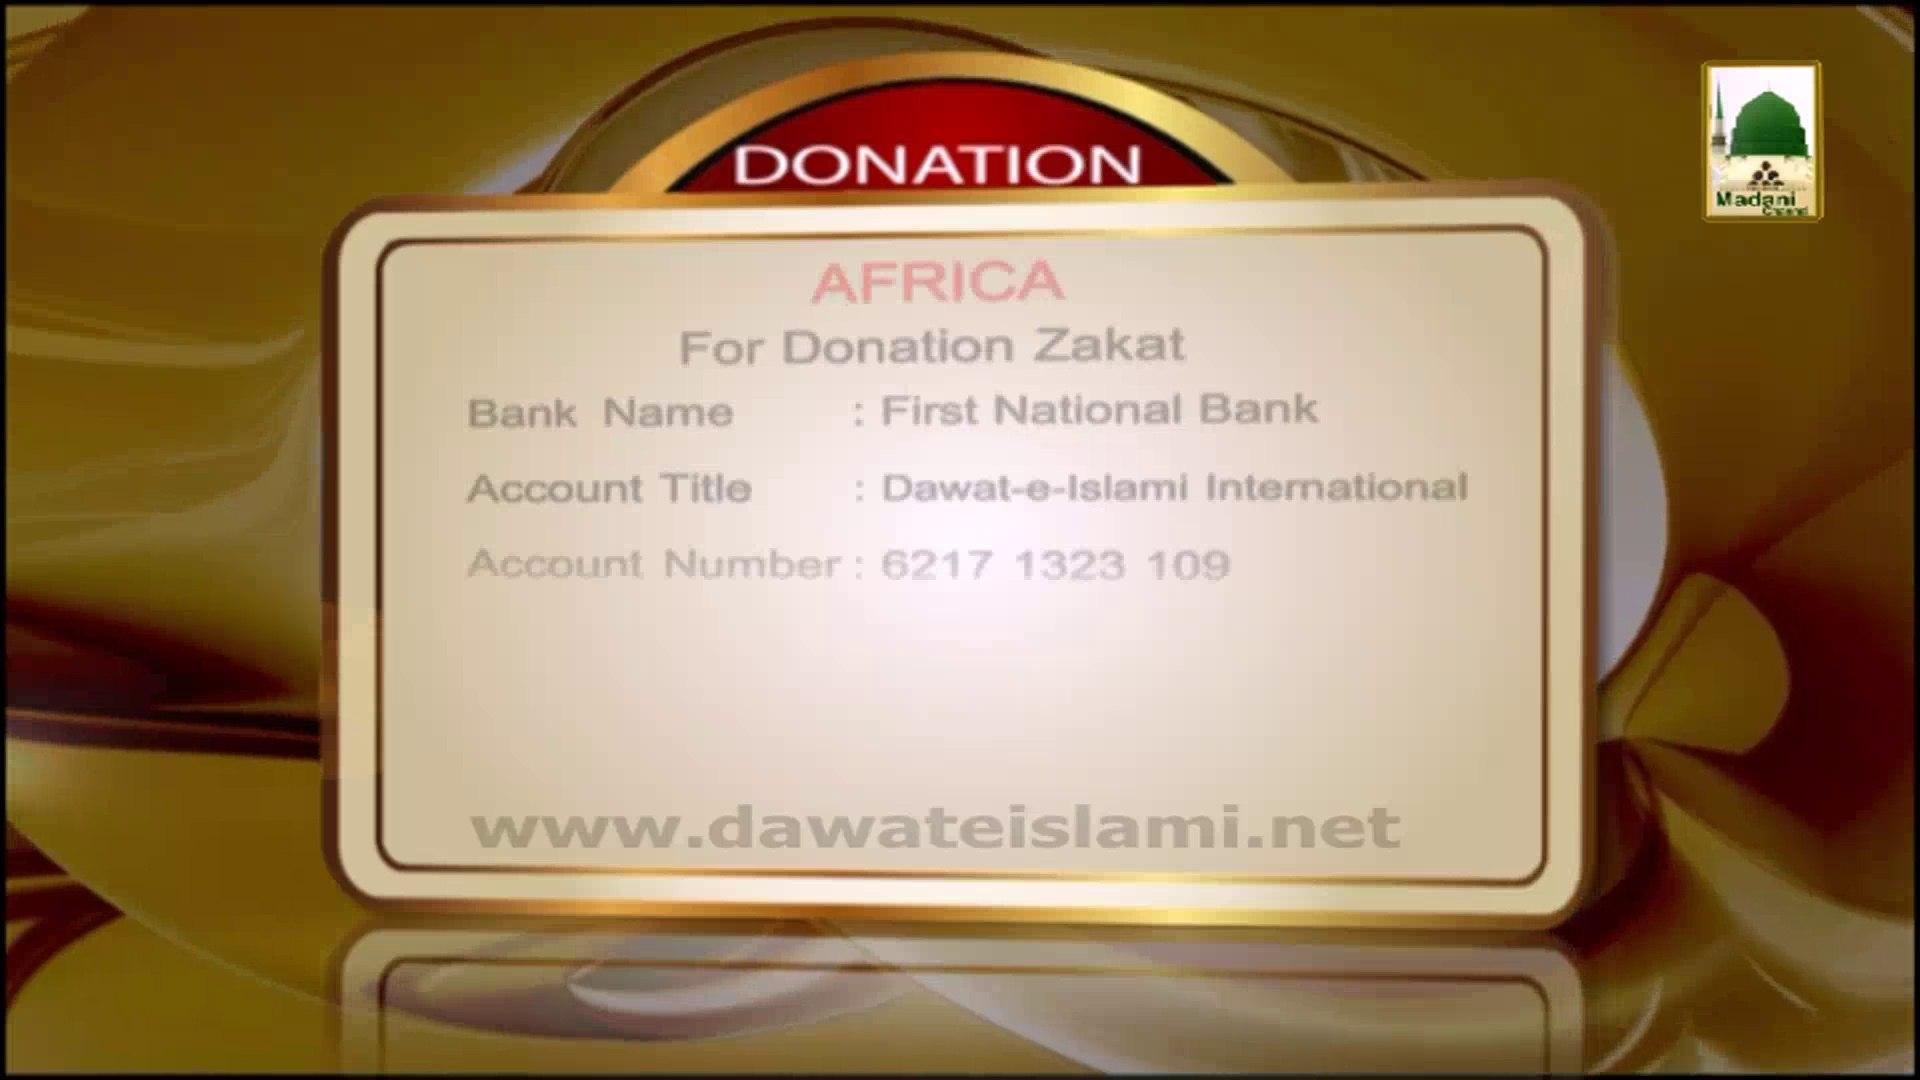 Promo Donation Sadaqaat E Wajiba And Zakat And Nafila Africa Bank Account 1 Video Dailymotion